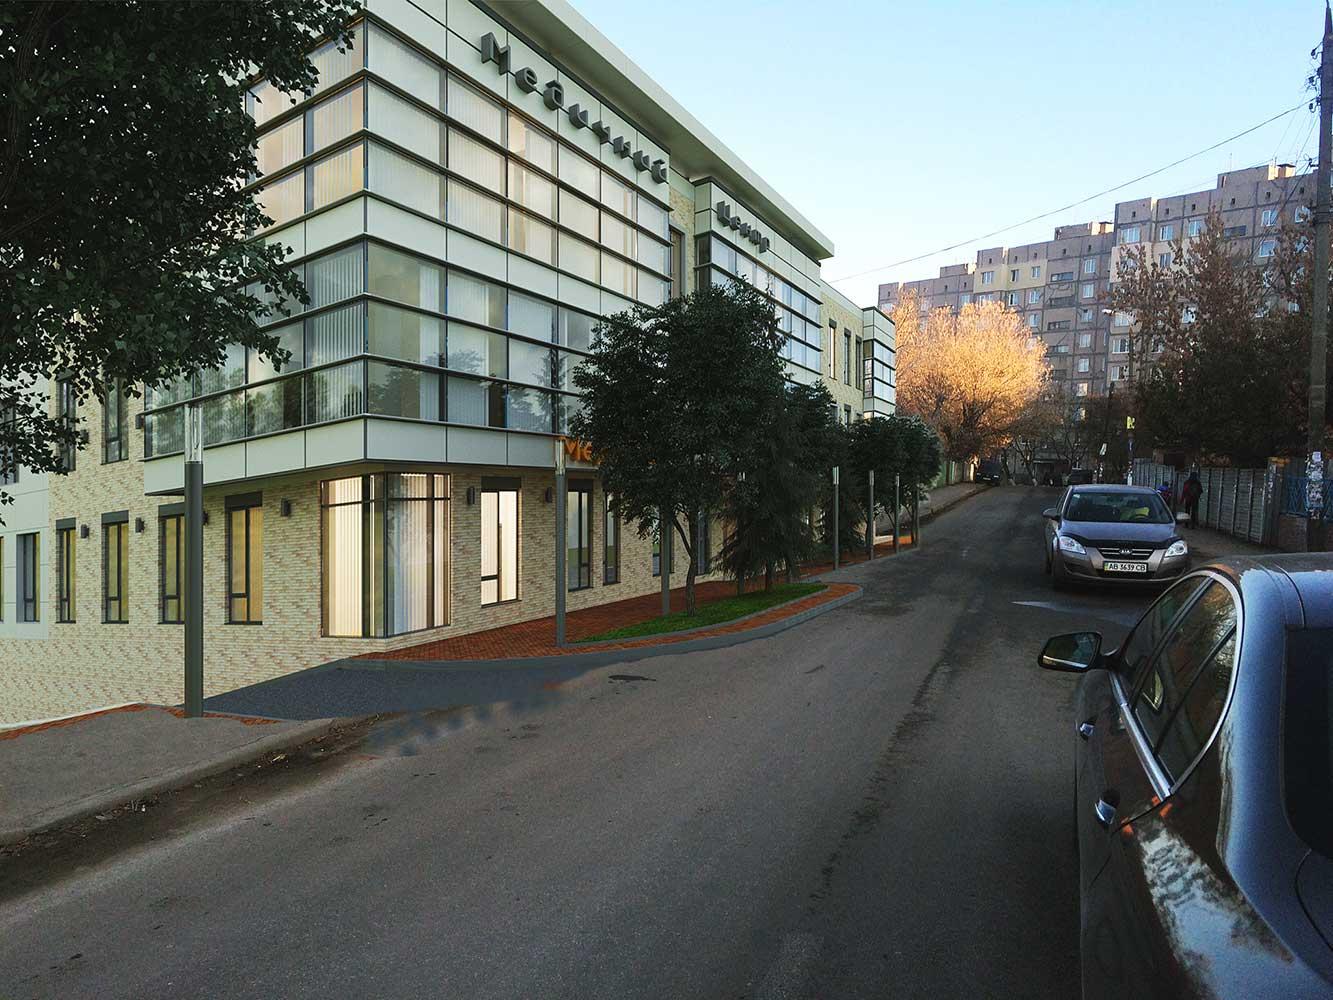 Лечебно-диагностический центр «Медилюкс» (фото 11)